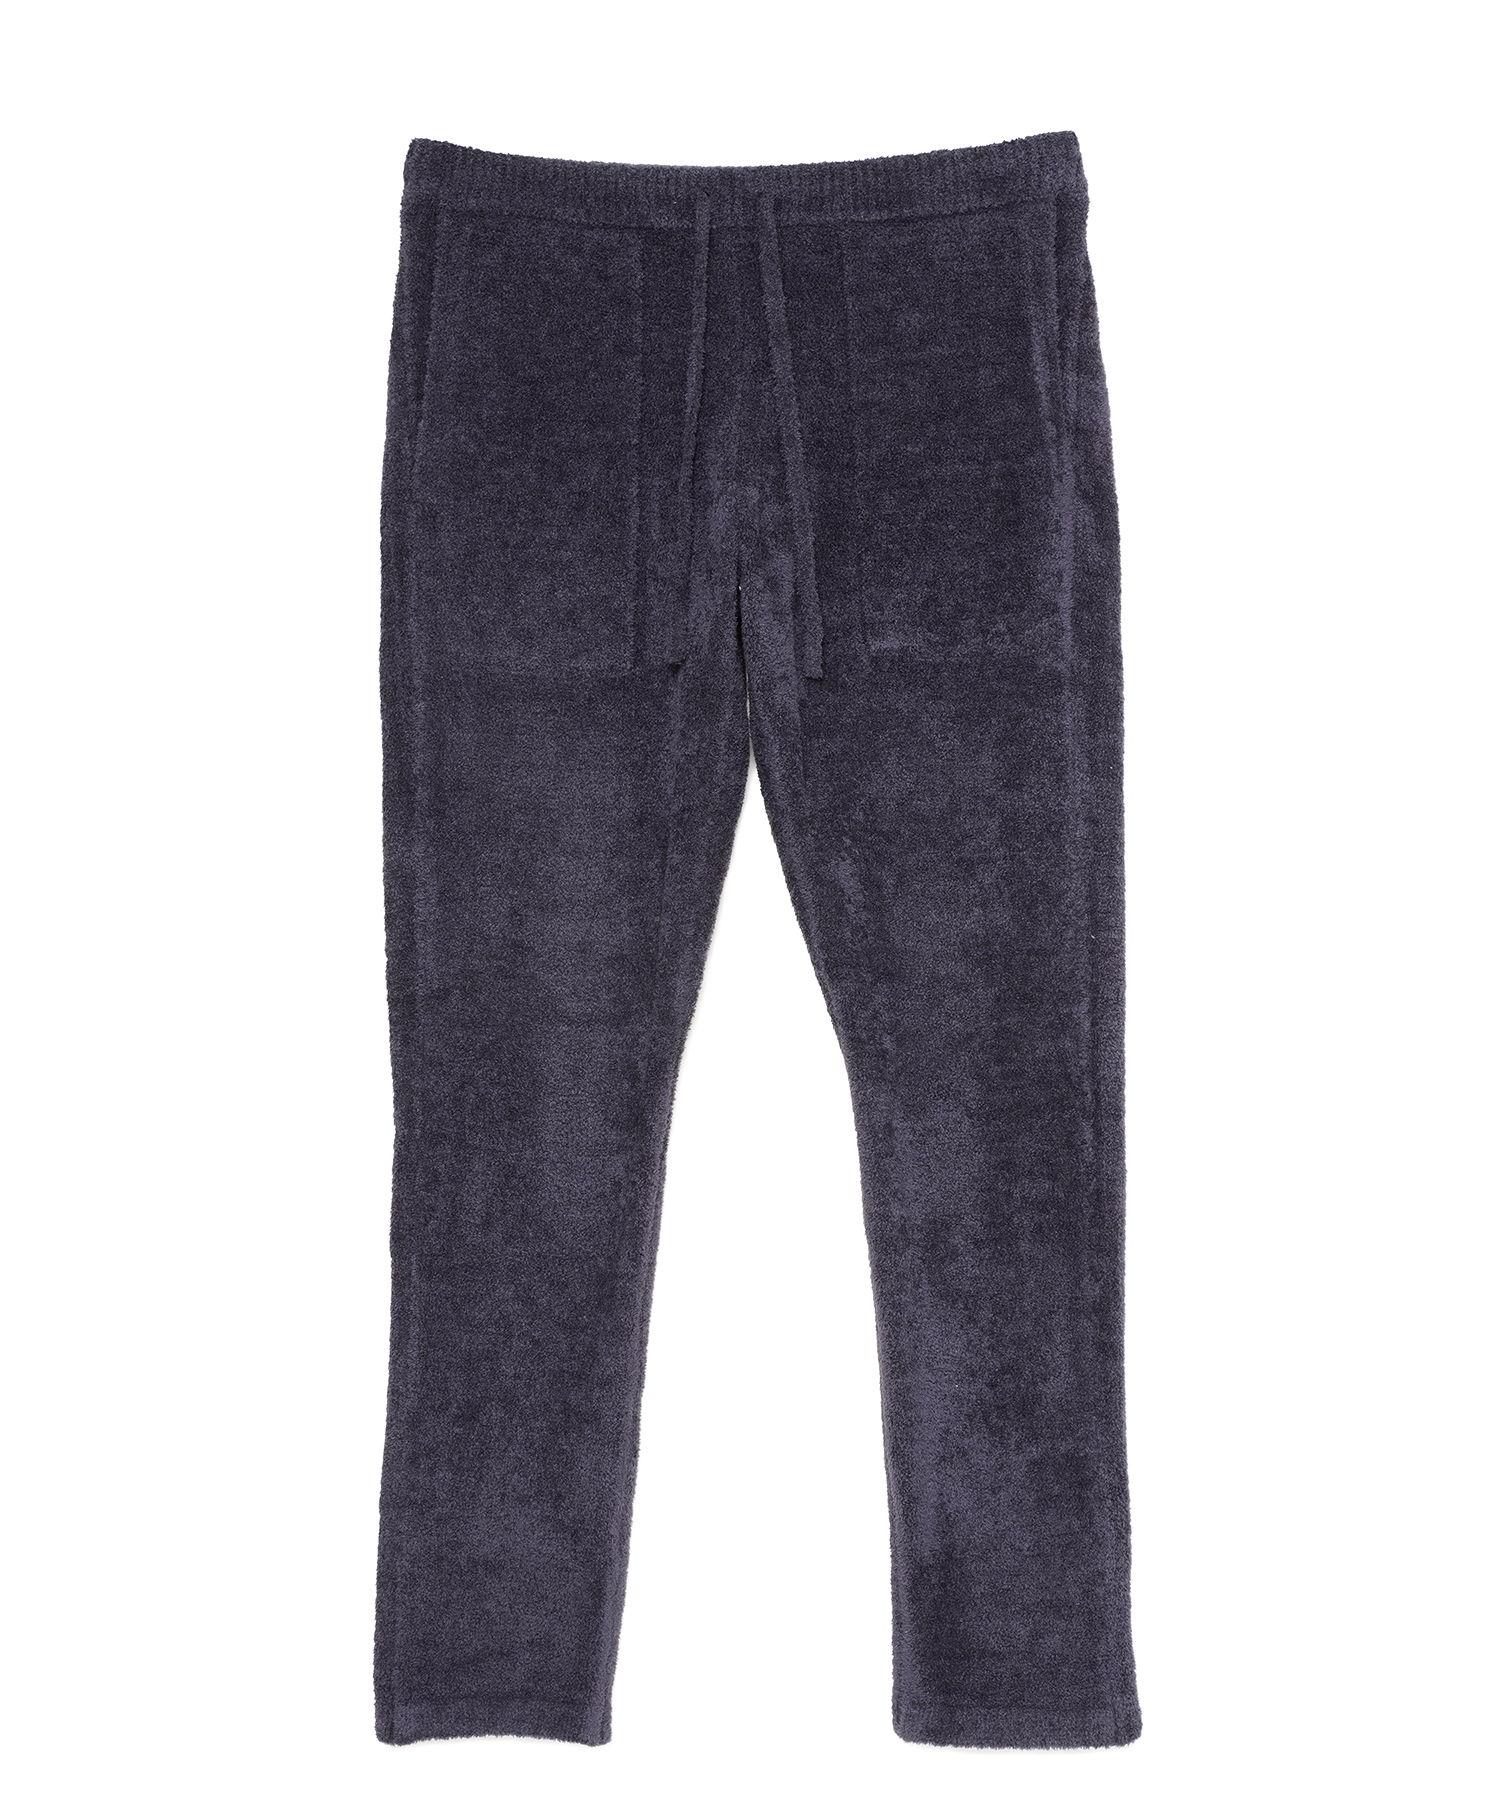 MOCO room wear pants